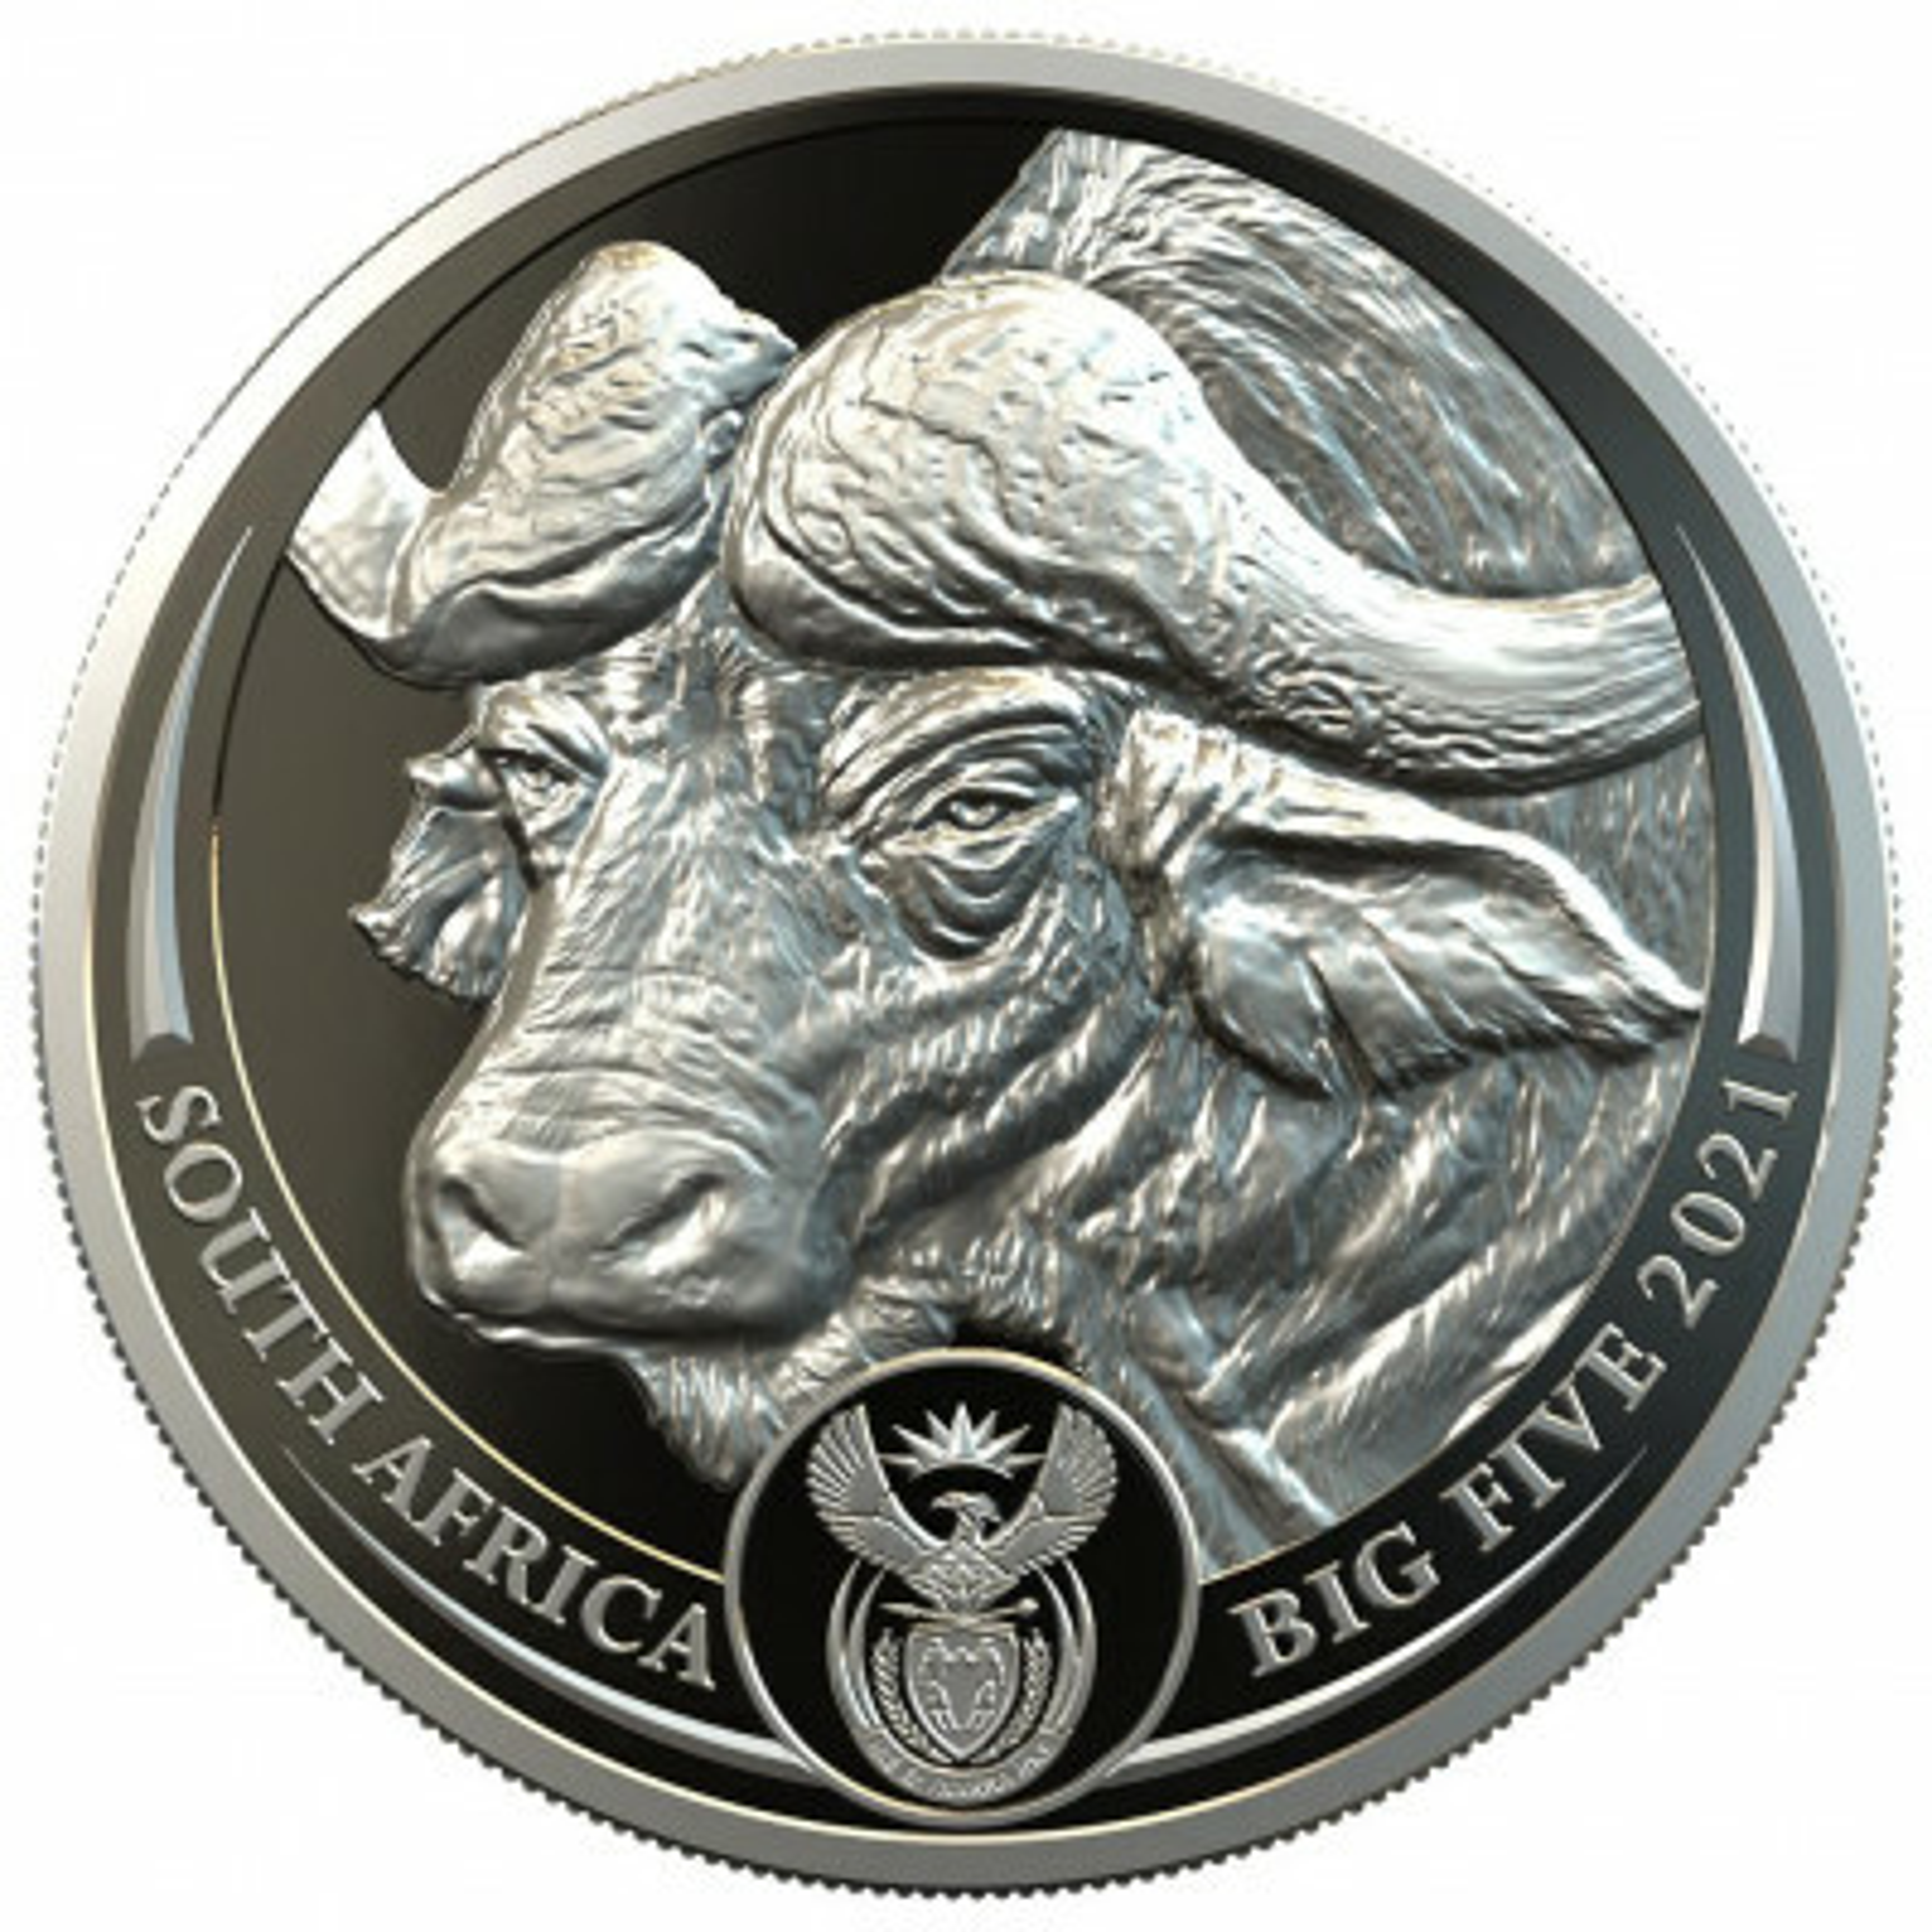 1 Troy ounce platina munt Big Five buffalo 2021 Proof